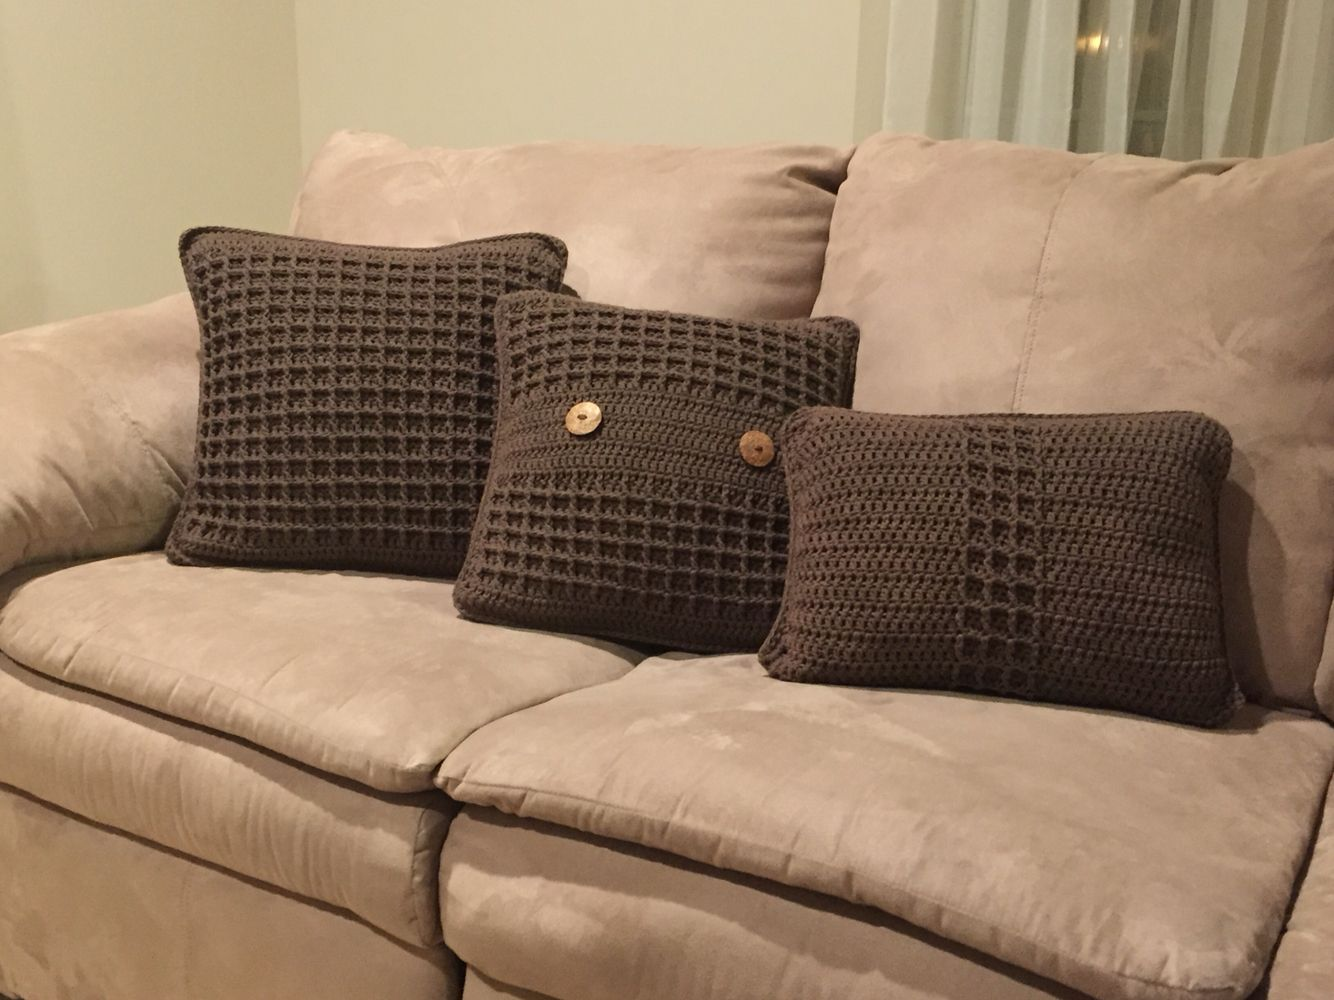 Couch cushions crochet waffle stitch crochet cushion cover crochet